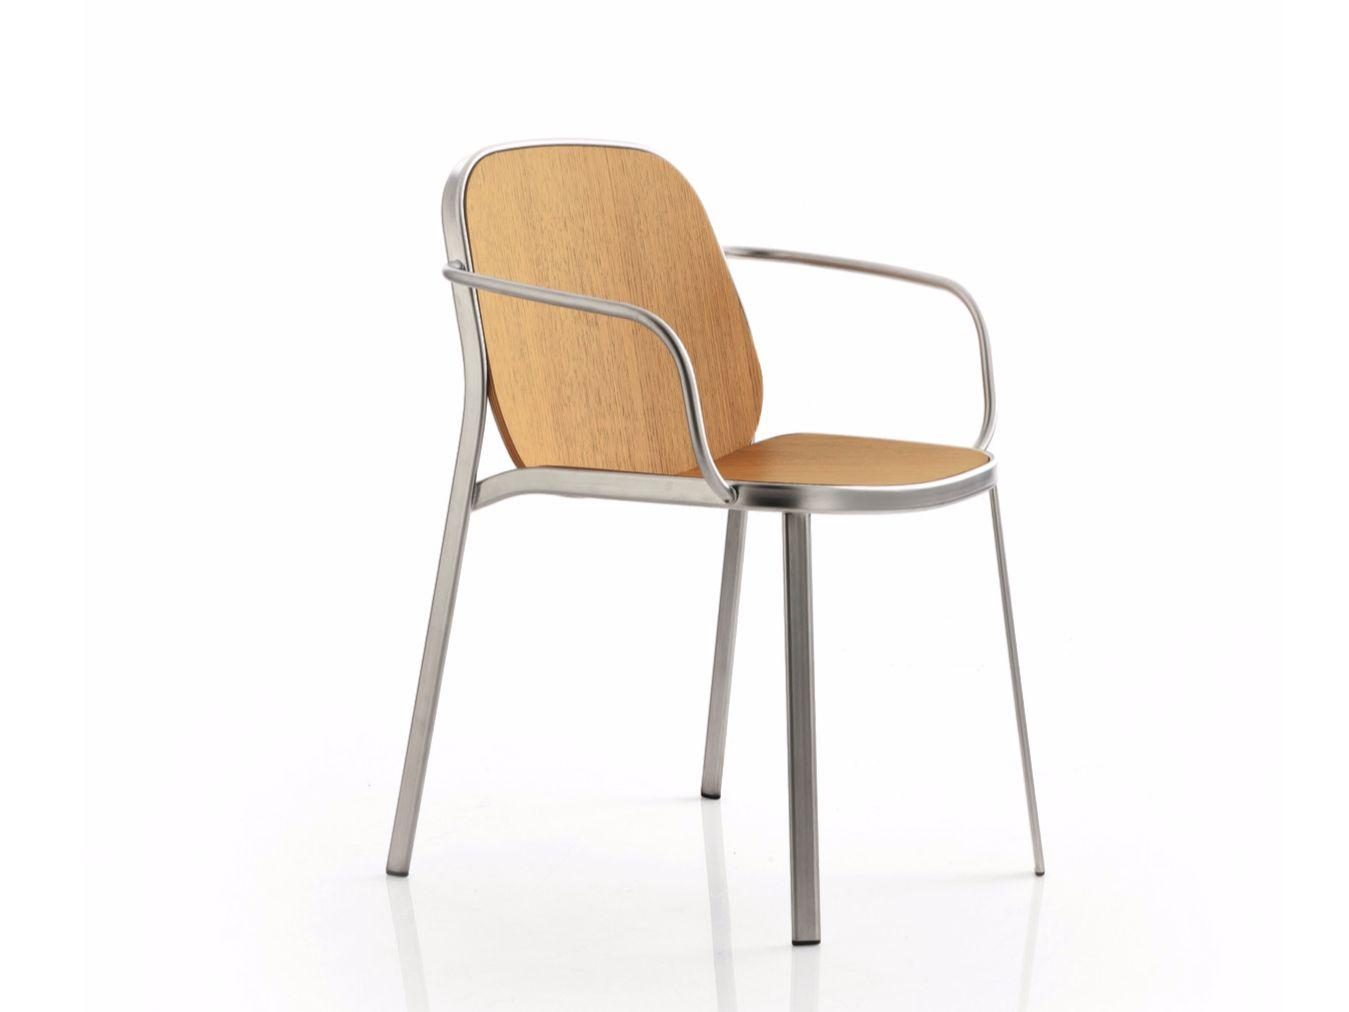 flap chaise d 39 accueil collection flap by emmegi design luca nichetto. Black Bedroom Furniture Sets. Home Design Ideas